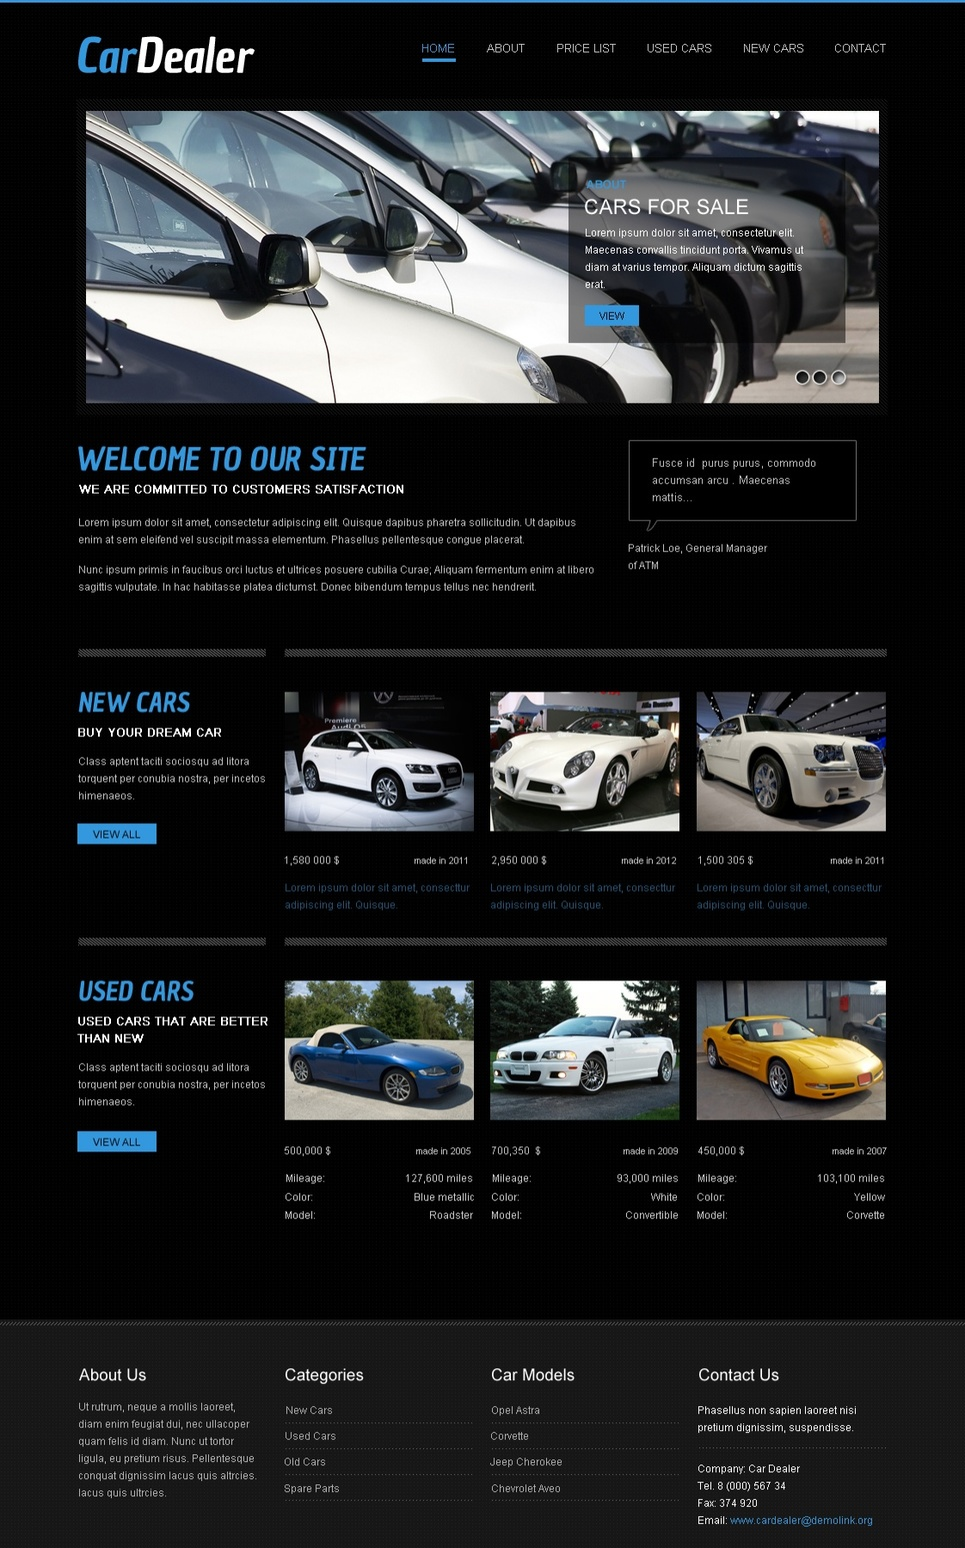 Black Colored Website Template for Car Dealers - image